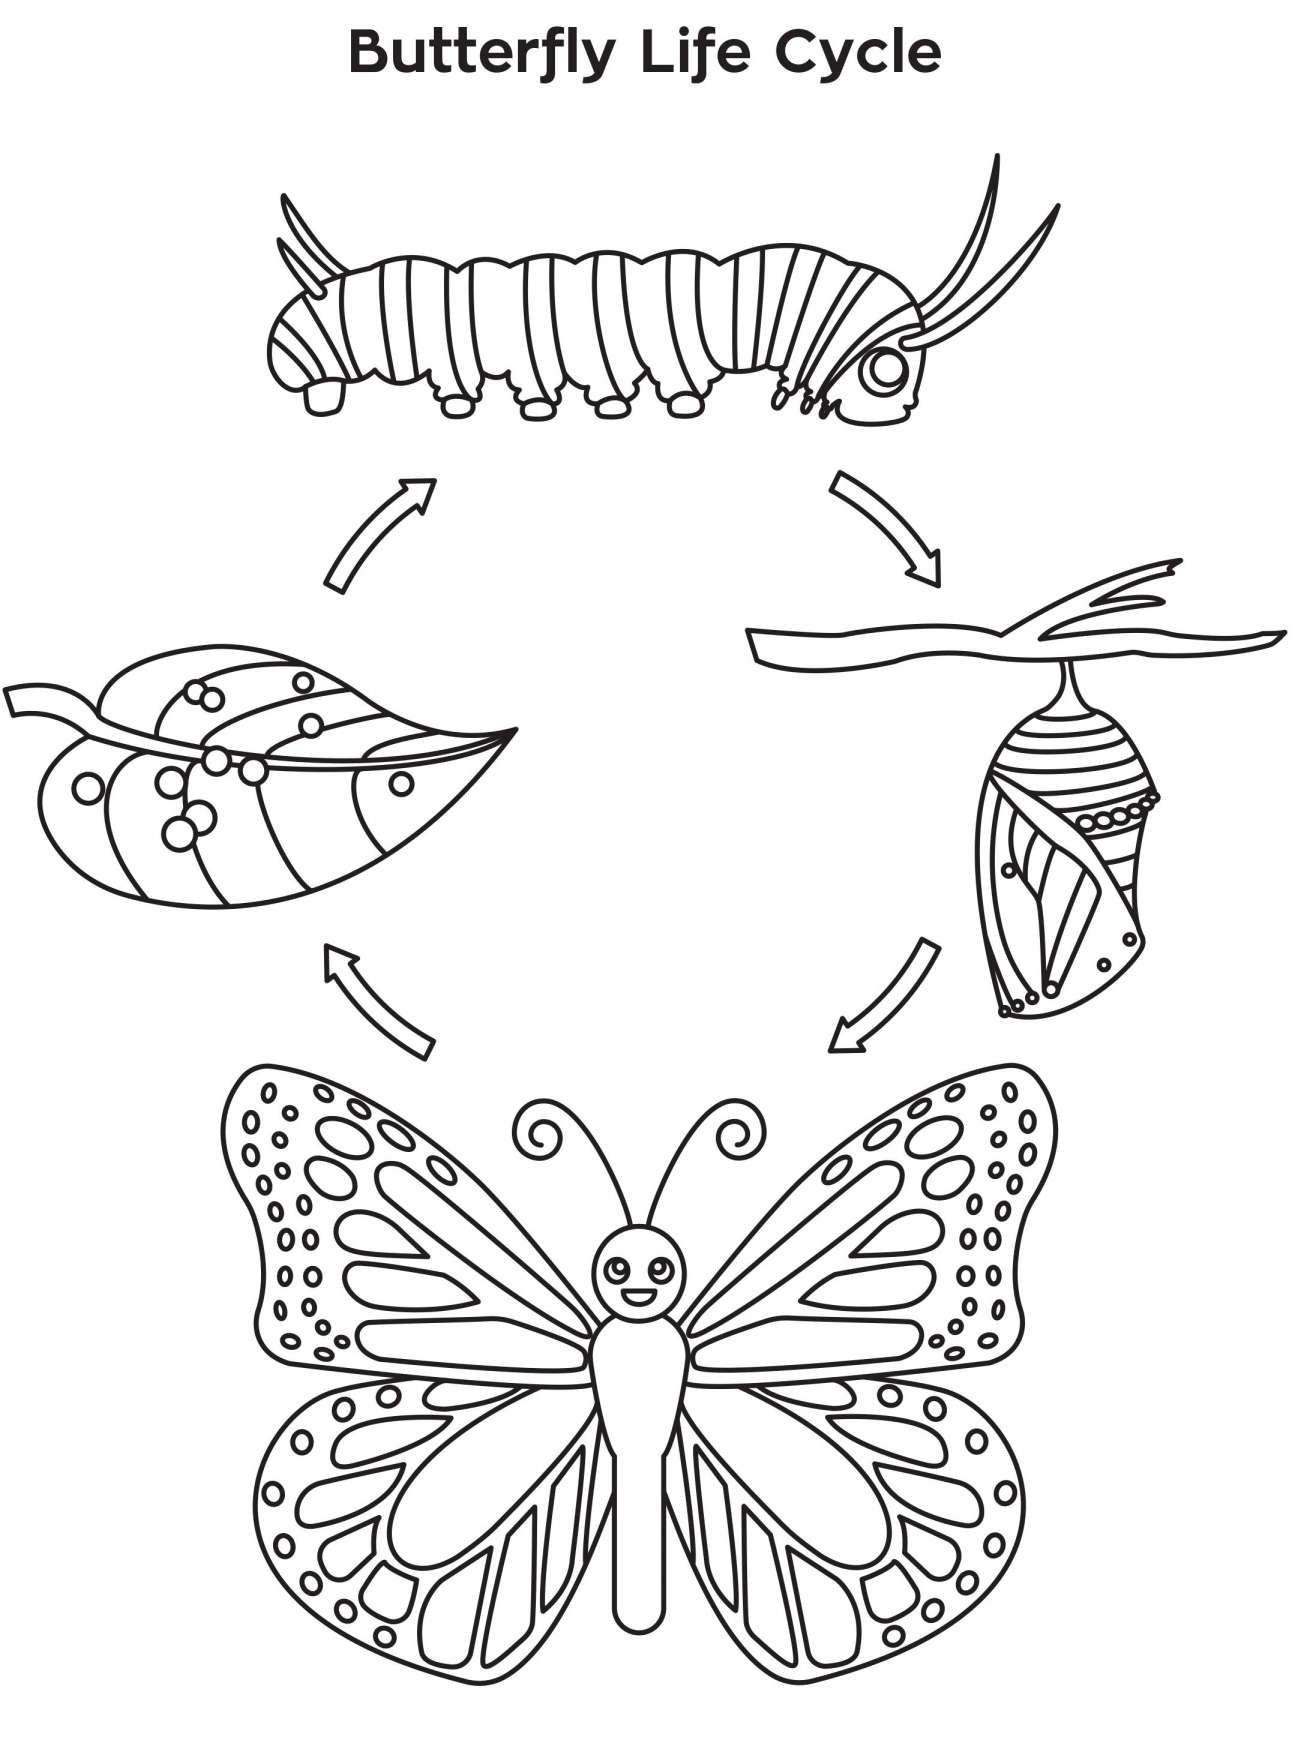 Predownload: 10 Butterfly Life Cycle Worksheet 1st Grade Chart Sheet Com Vlinders Insecten Rups [ 1761 x 1313 Pixel ]